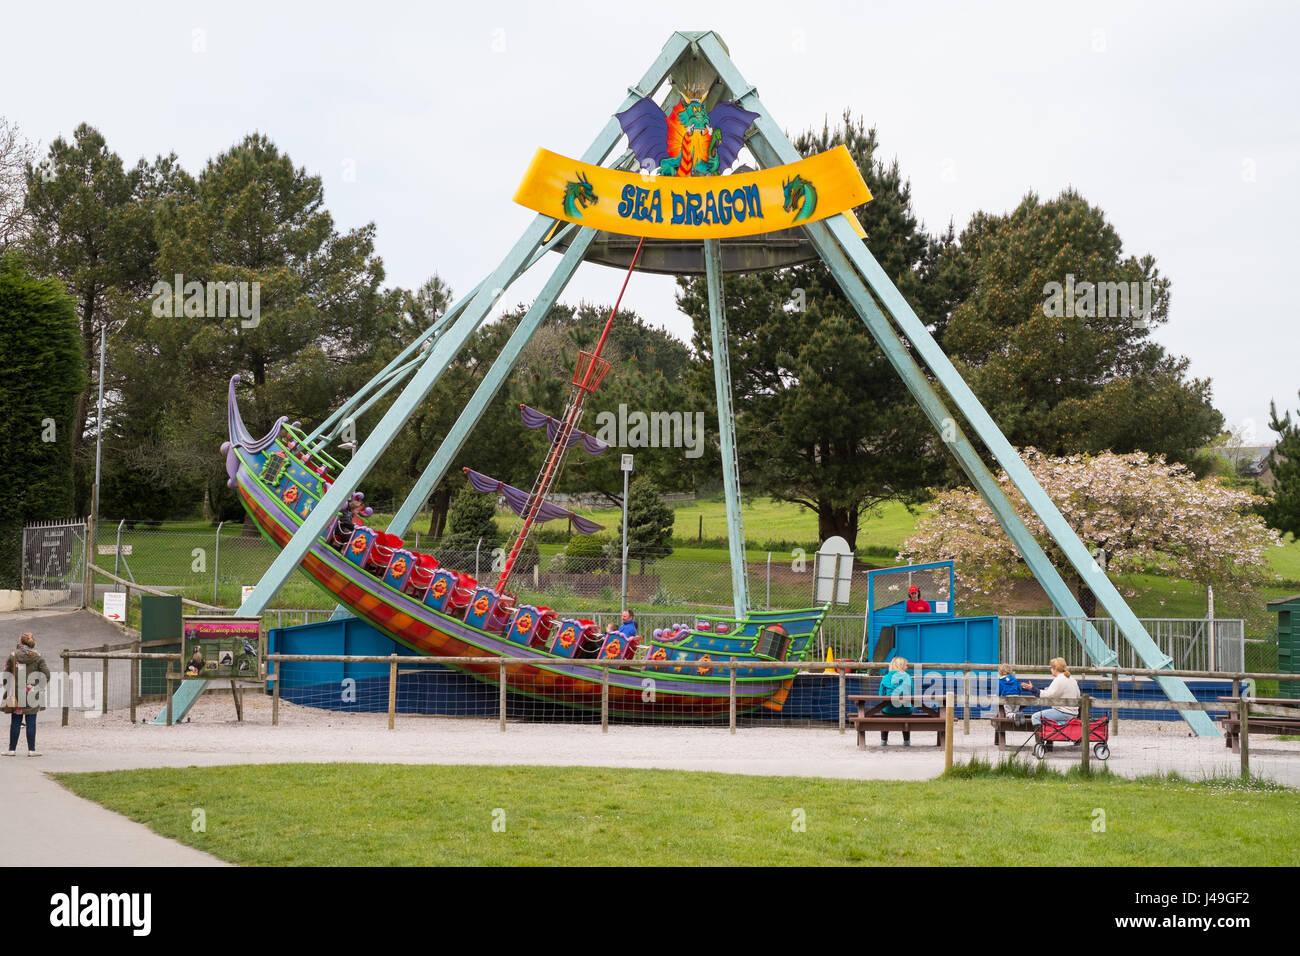 Sea Dragon swinging boat ride at Woodlands Family Theme Park, Totnes, Devon , England, United Kingdom. - Stock Image